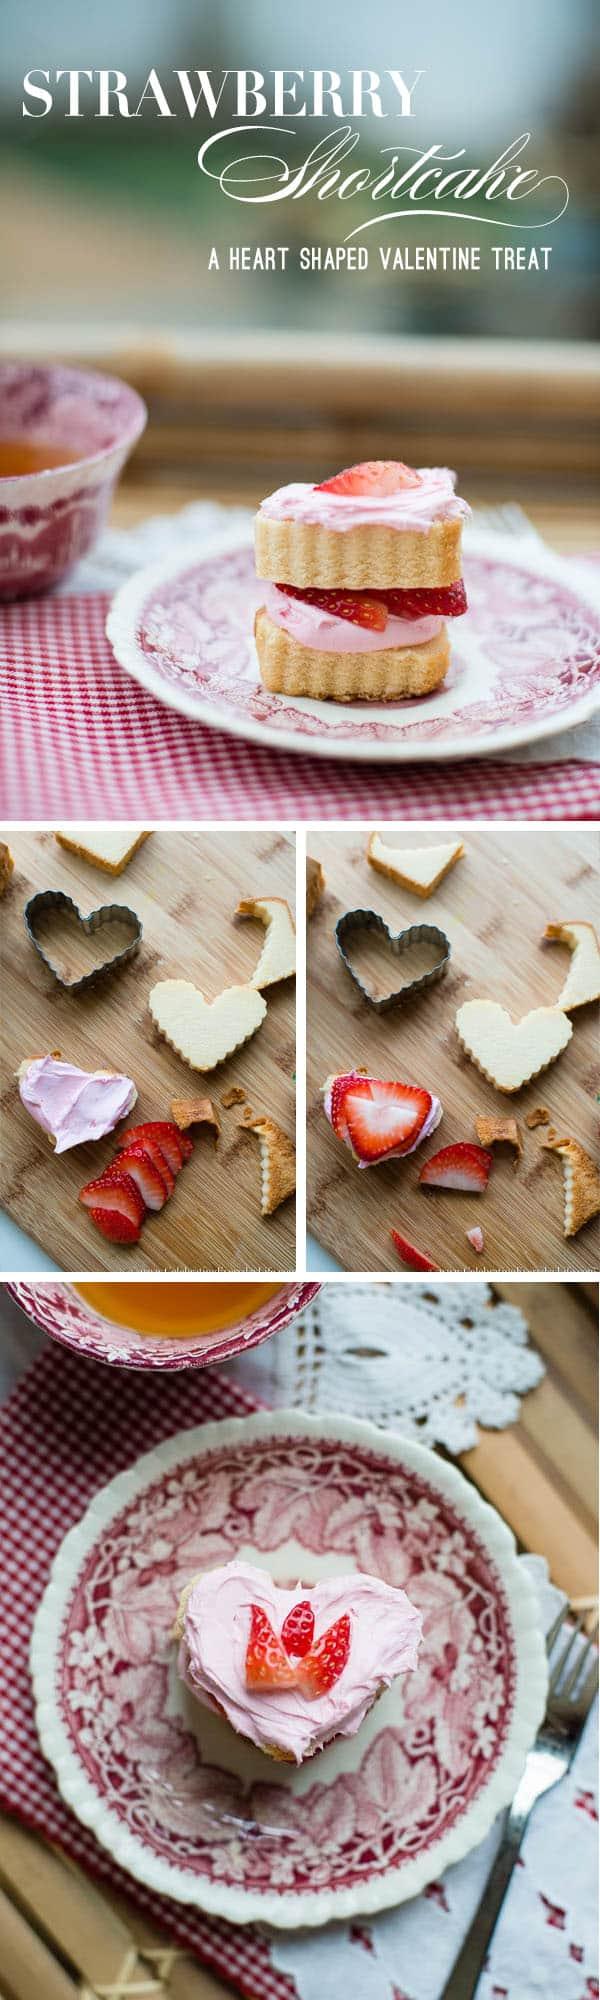 no bake Strawberry Shortcake recipe, heart shaped strawberry shortcake recipe, simple valentine dessert, simple strawberry dessert, 10 minute dessert recipe, Celebrating Everyday Life with Jennifer Carroll